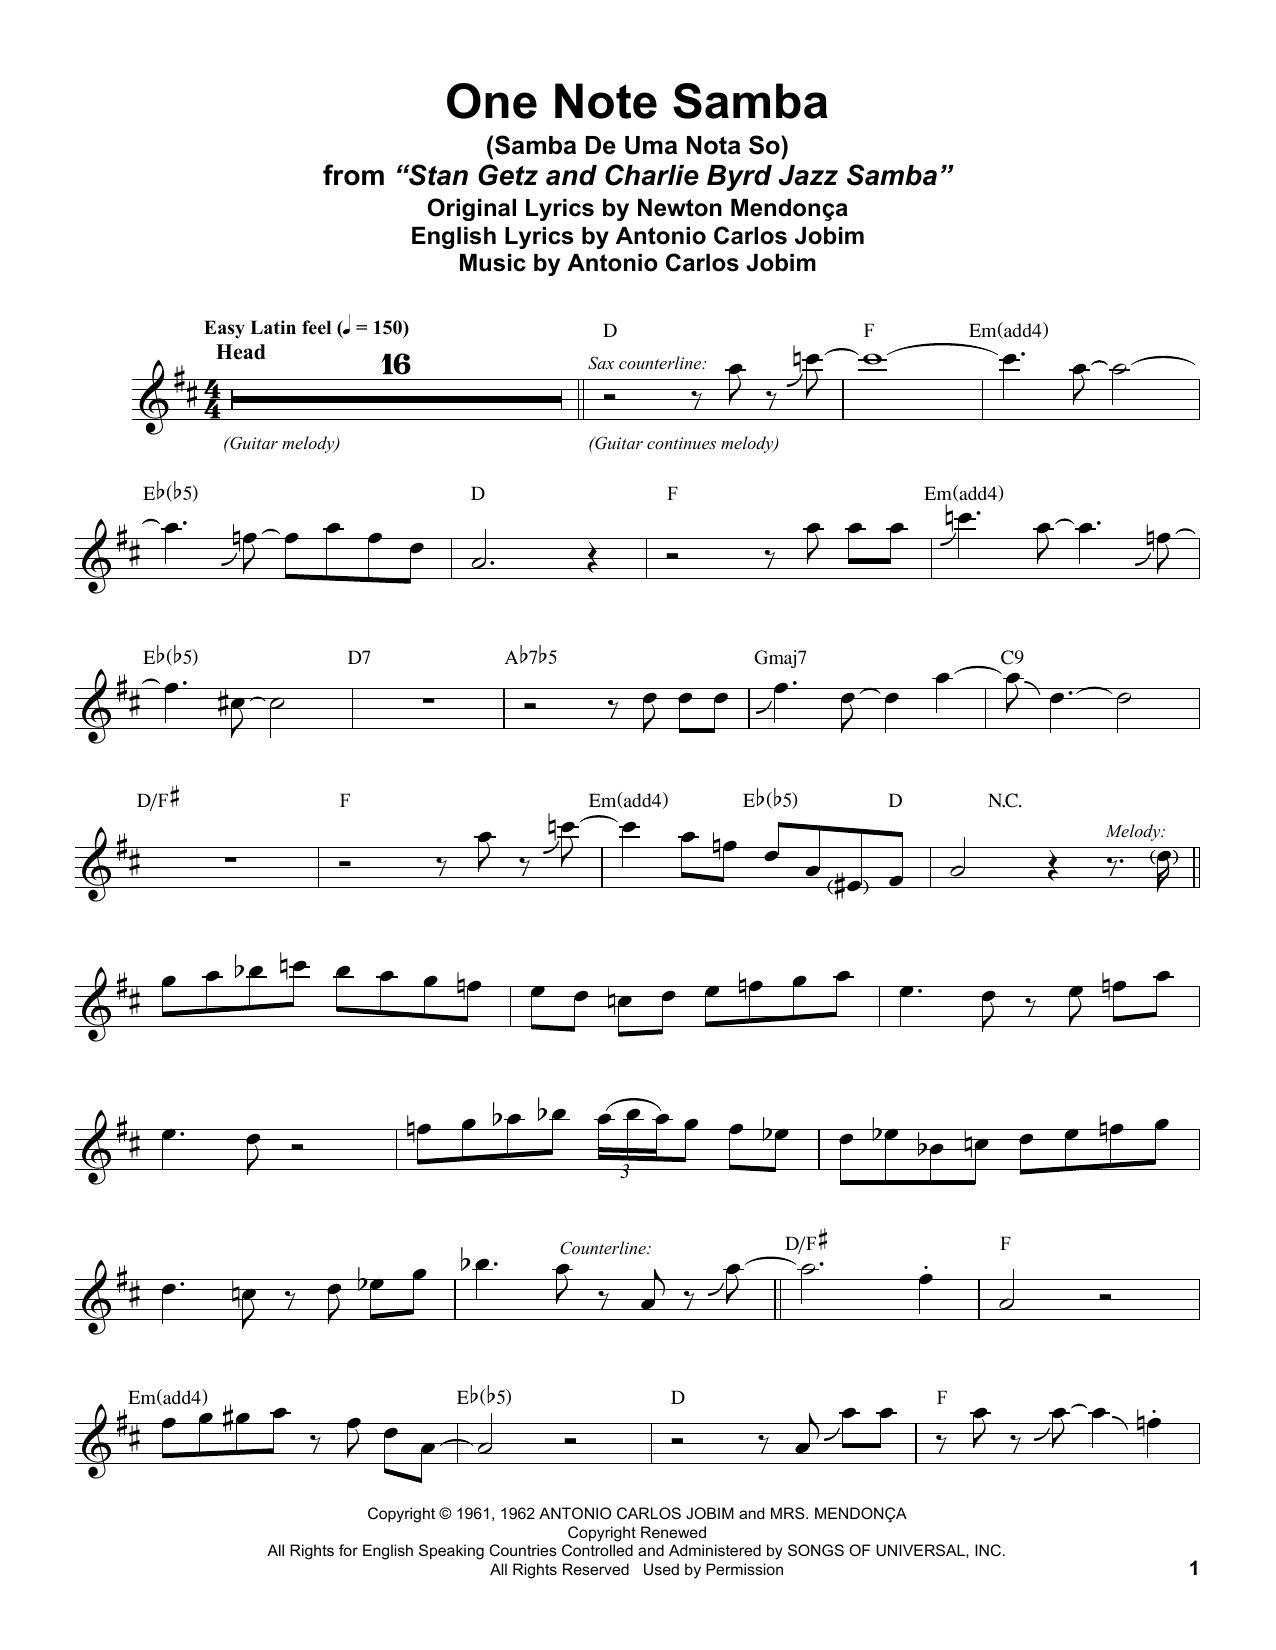 Stan Getz One Note Samba Samba De Uma Nota So Sheet Music Notes